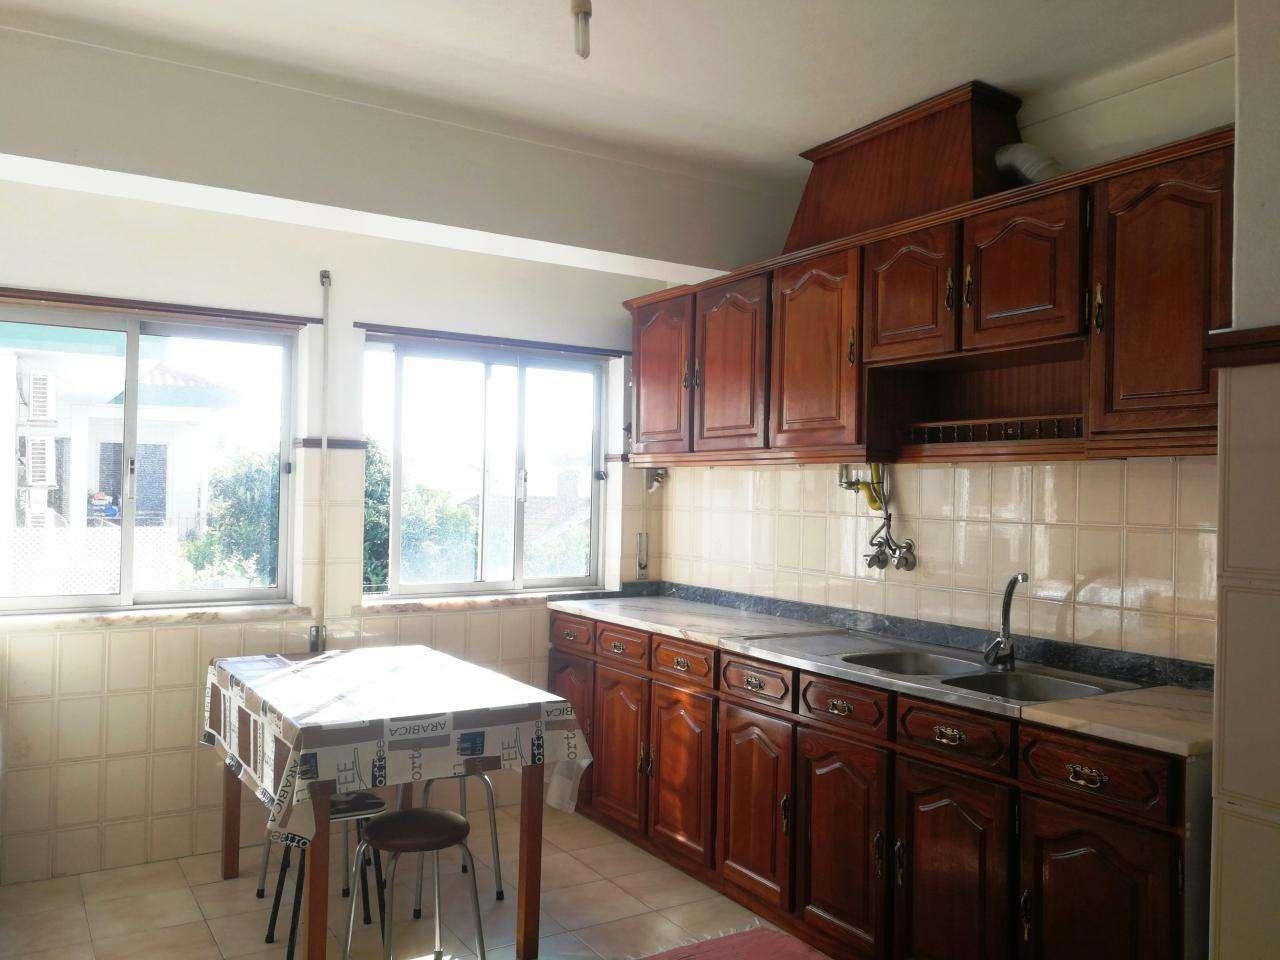 Apartamento para arrendar, Parceiros e Azoia, Leiria - Foto 2